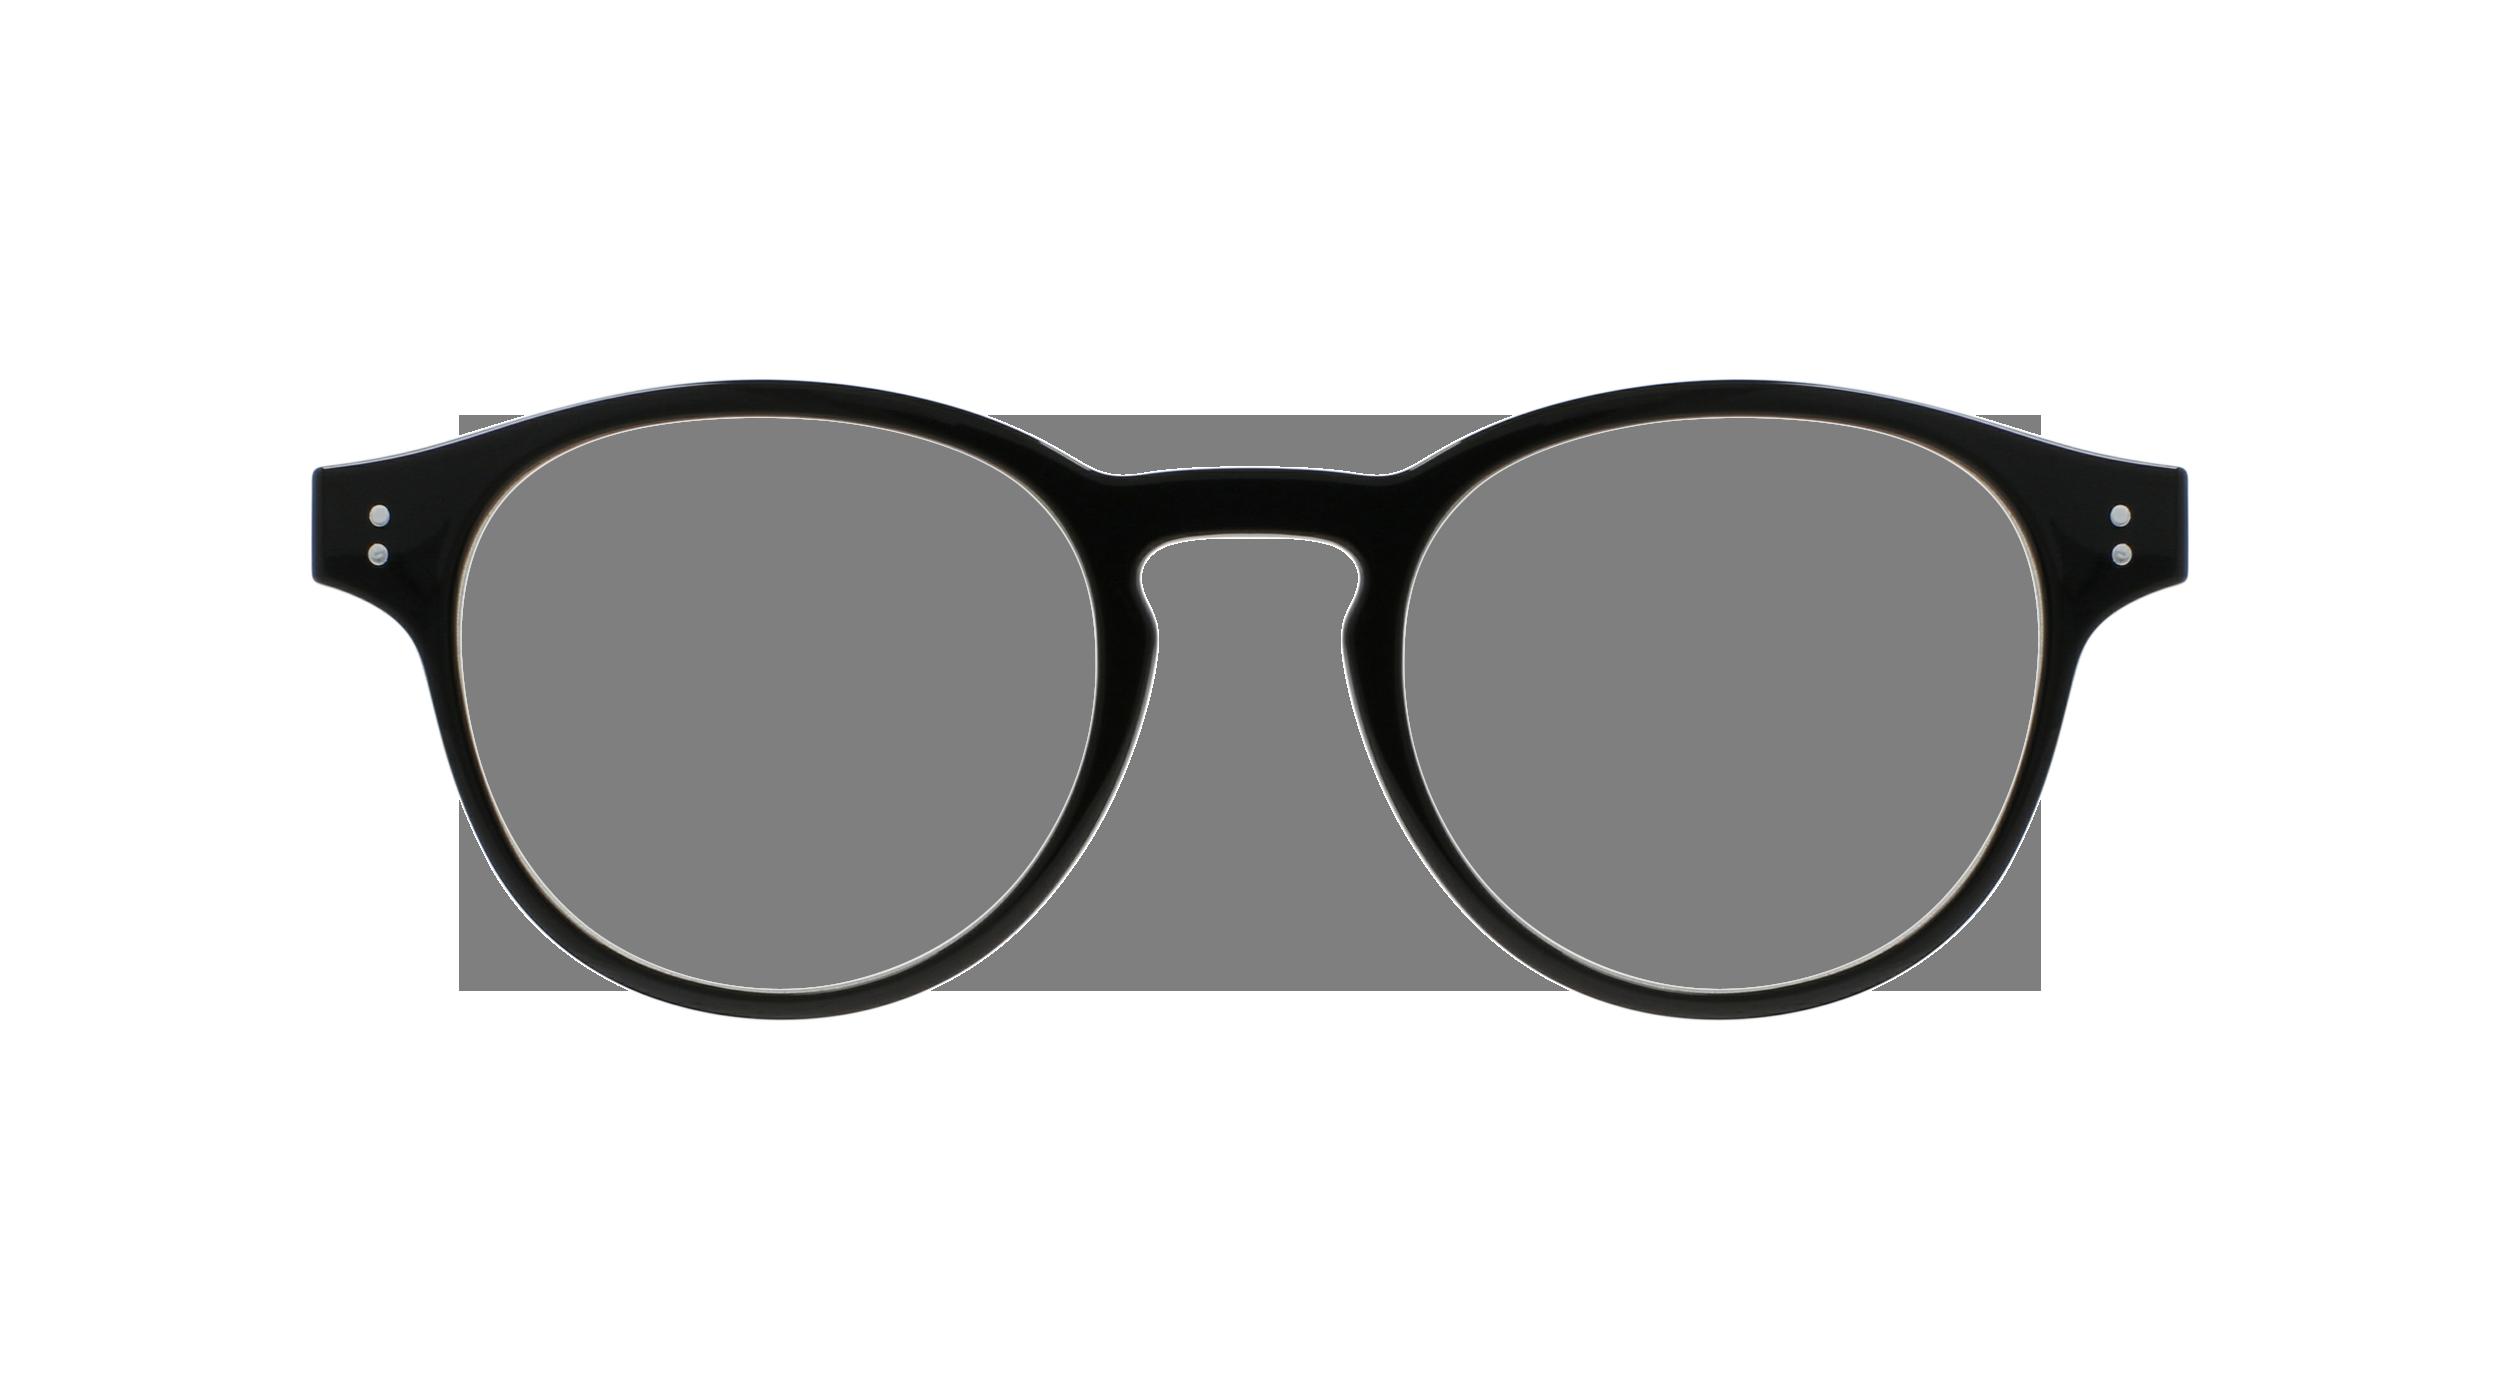 afflelou/france/products/smart_clip/clips_glasses/07630036452639.png